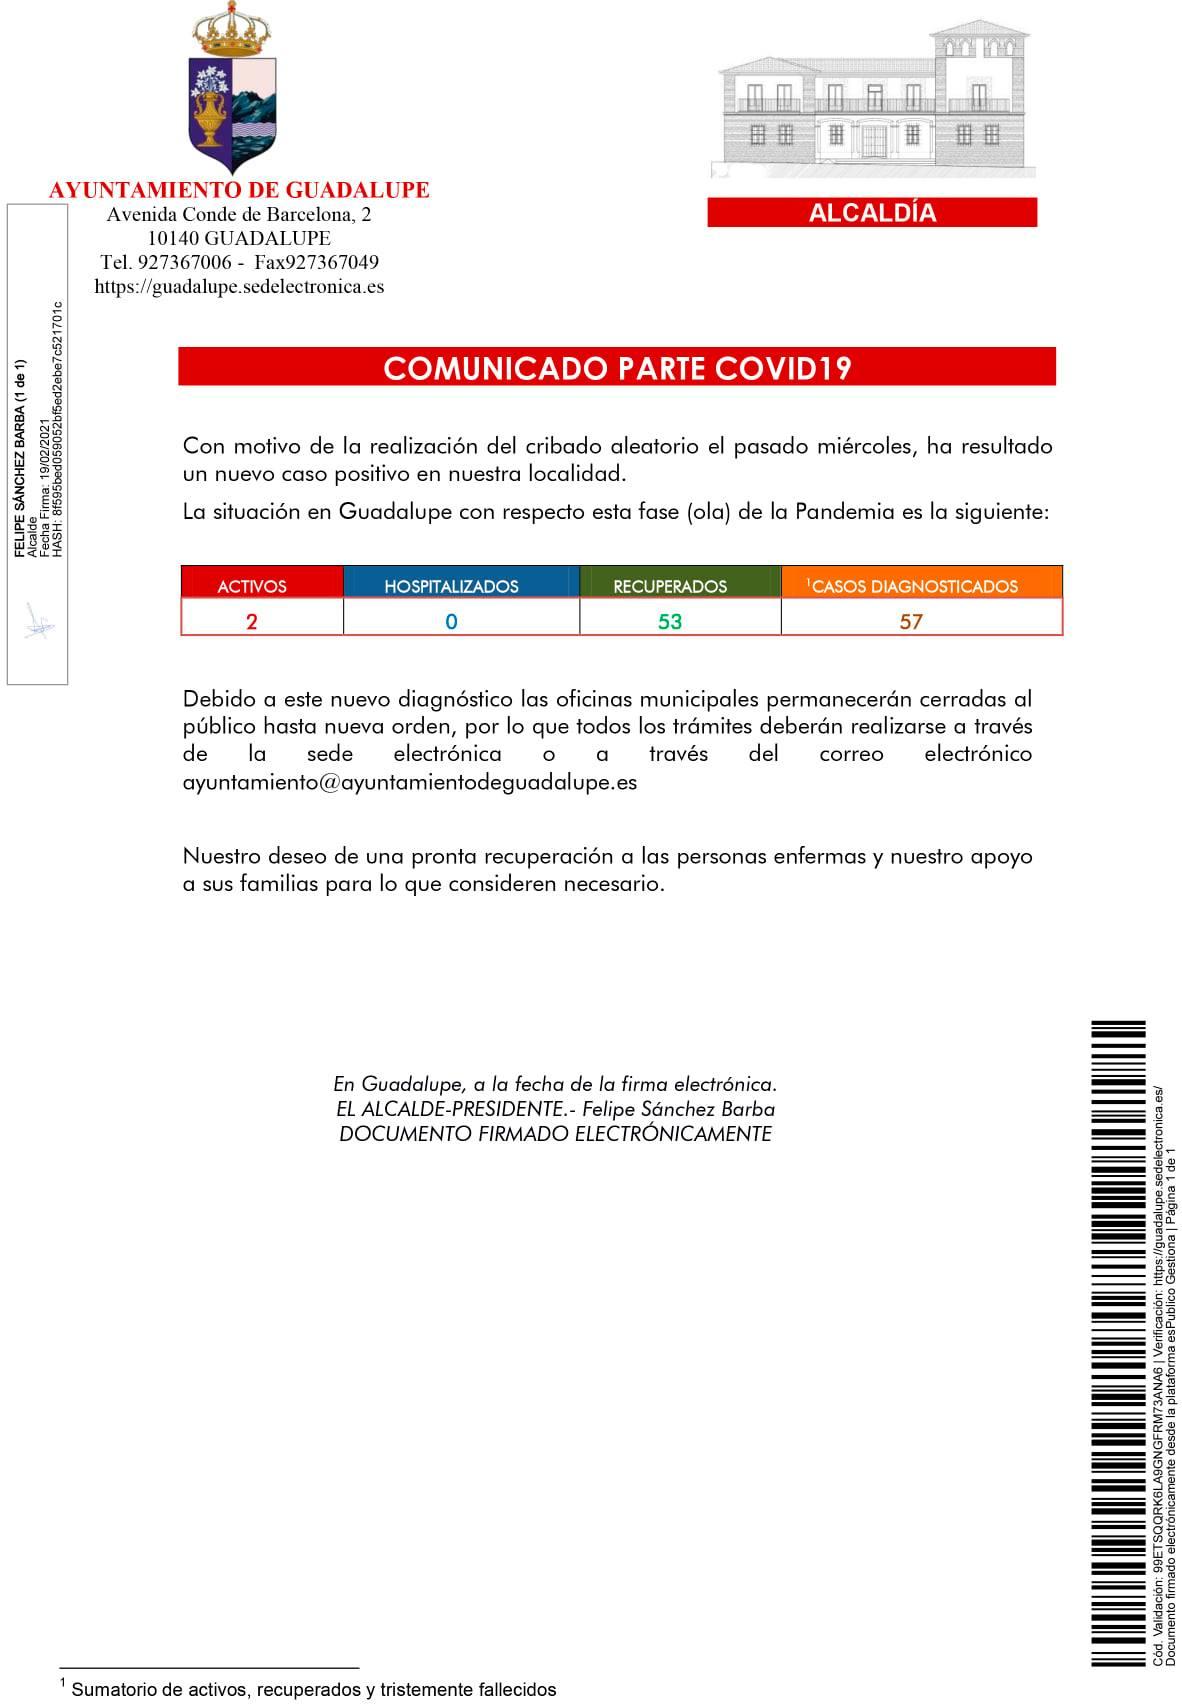 2 casos positivos activos de COVID-19 (febrero 2021) - Guadalupe (Cáceres)